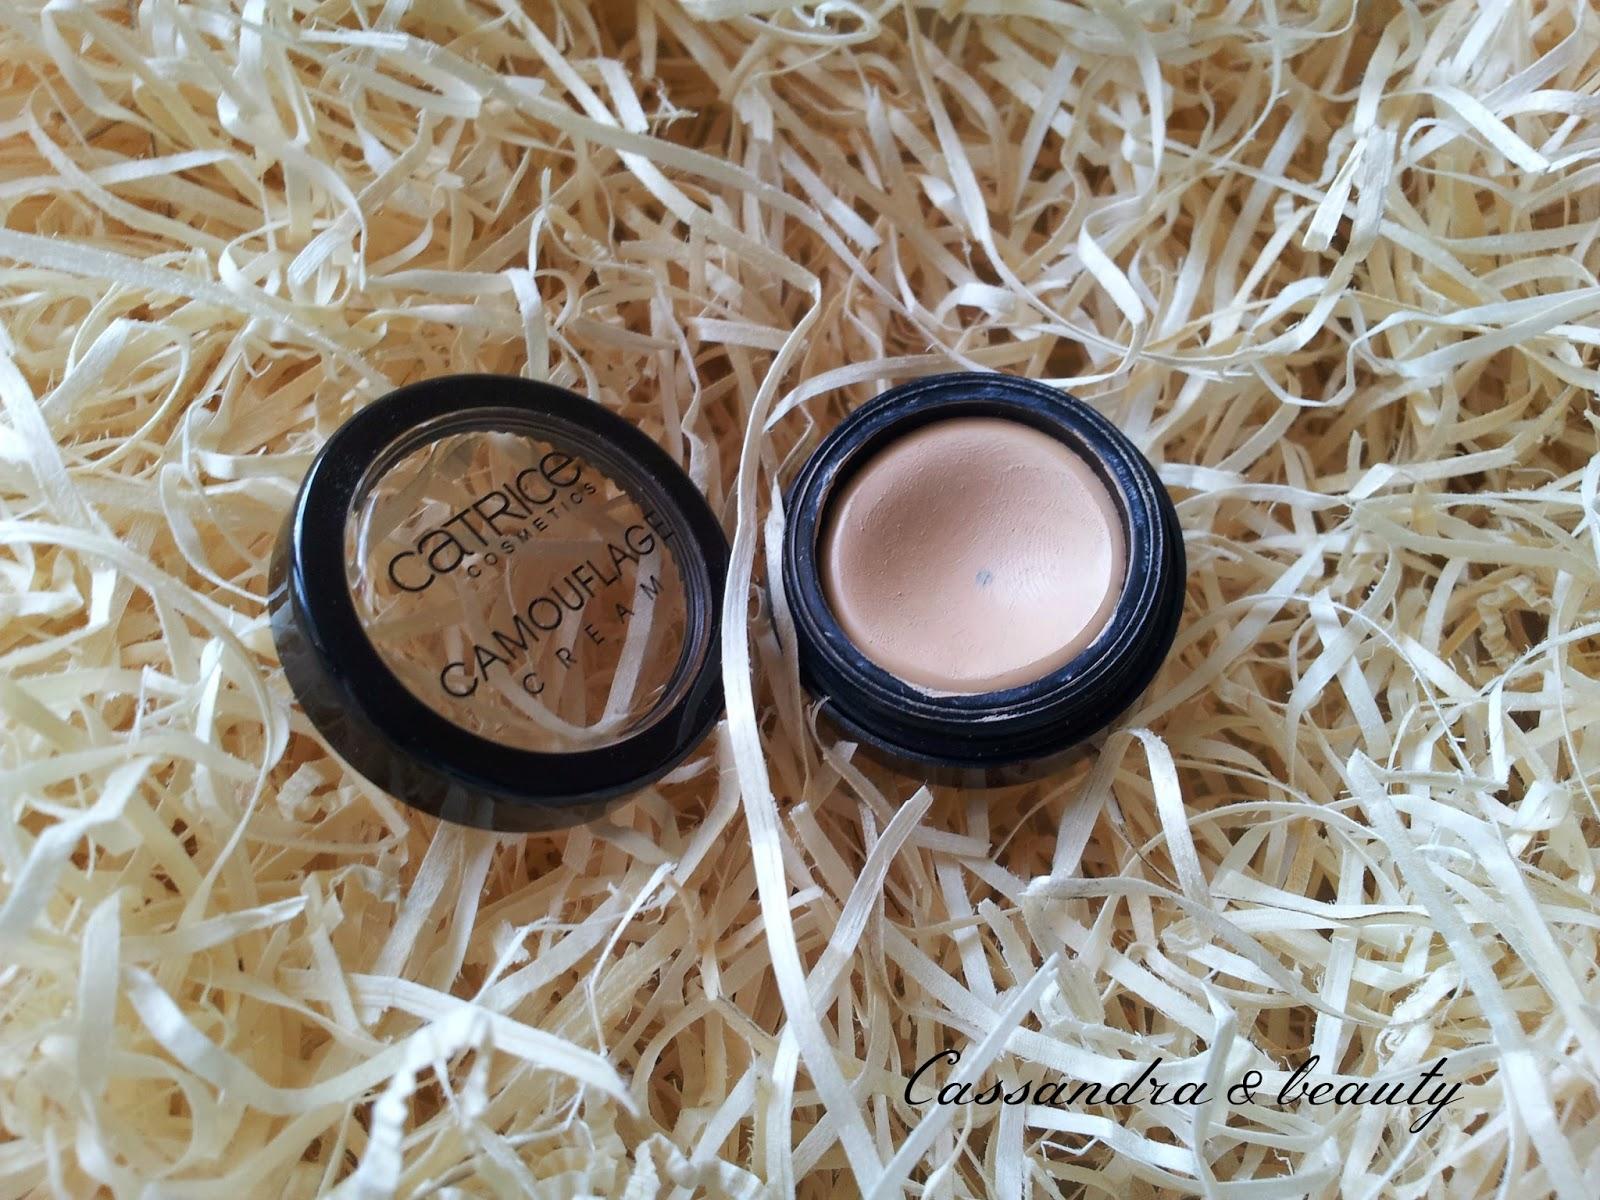 Correttore Catrice Camouflage Cream/ 020 Light Beige: recensione